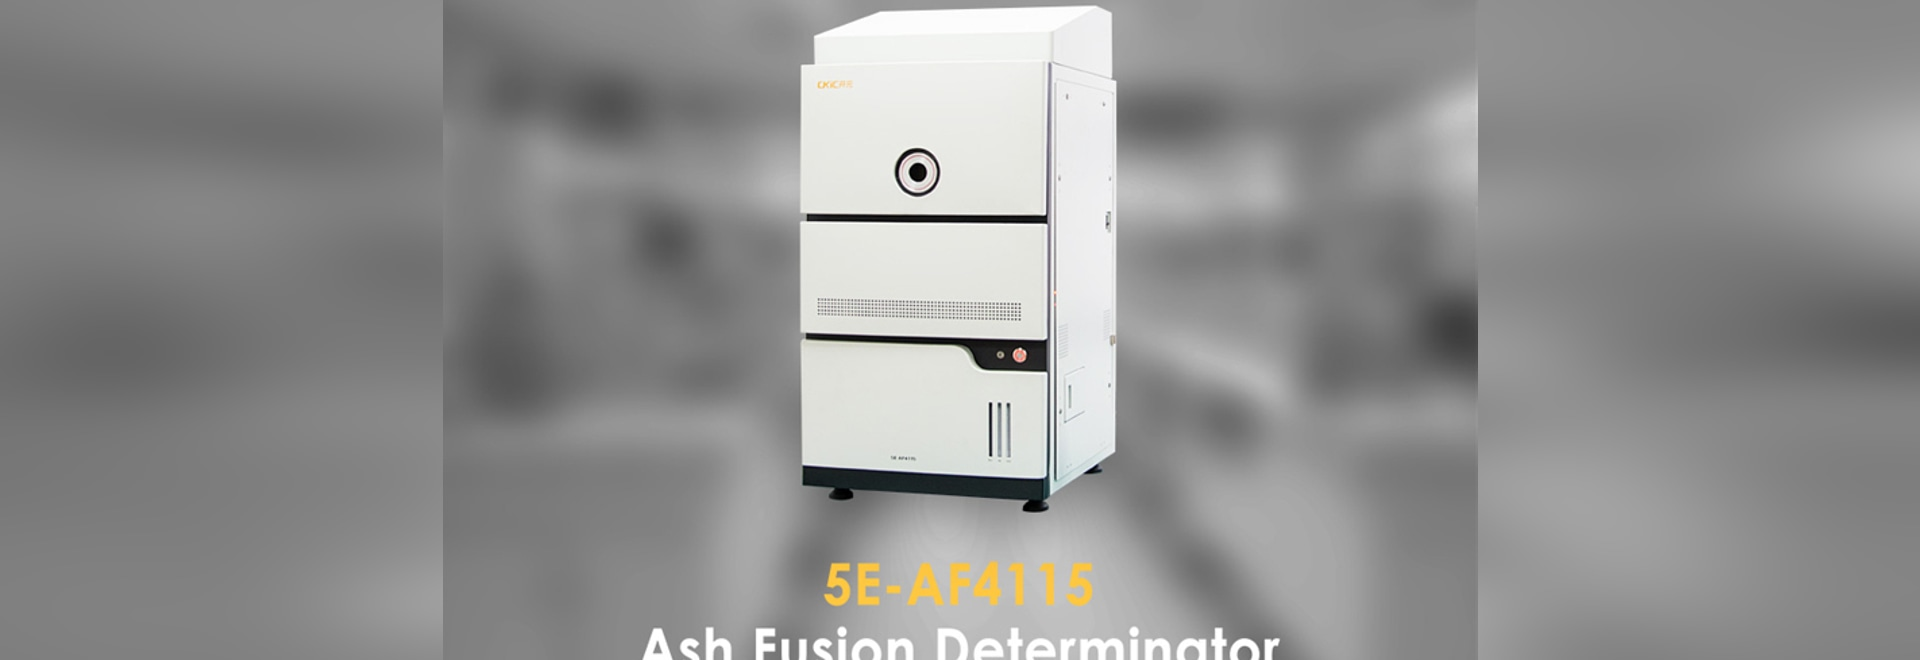 5E-AF4115 Ash Fusion Determinator